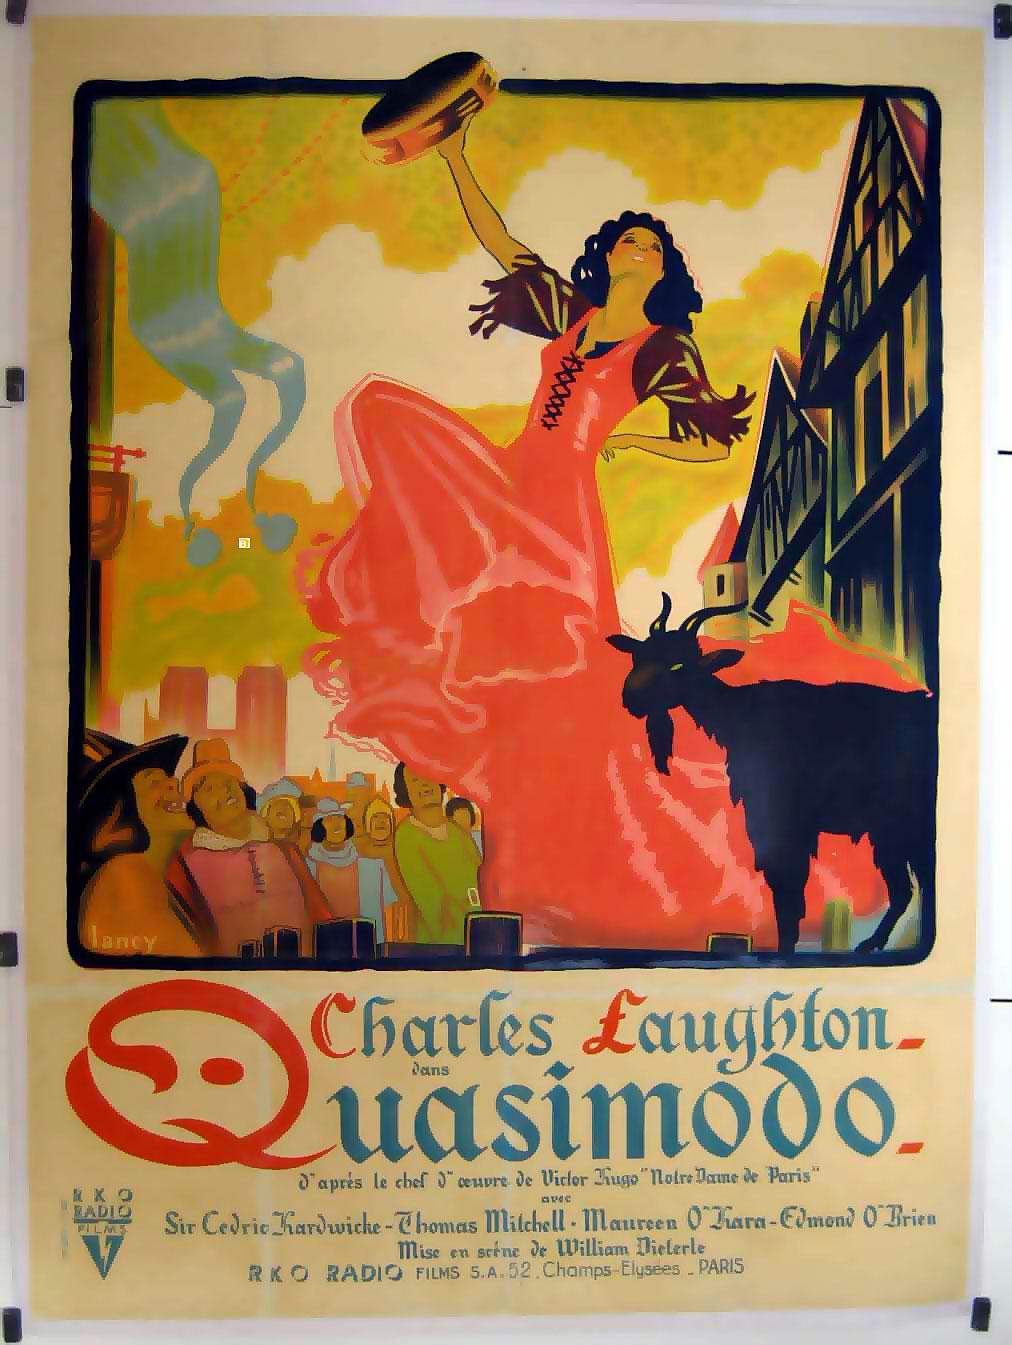 quasimodo film 1939